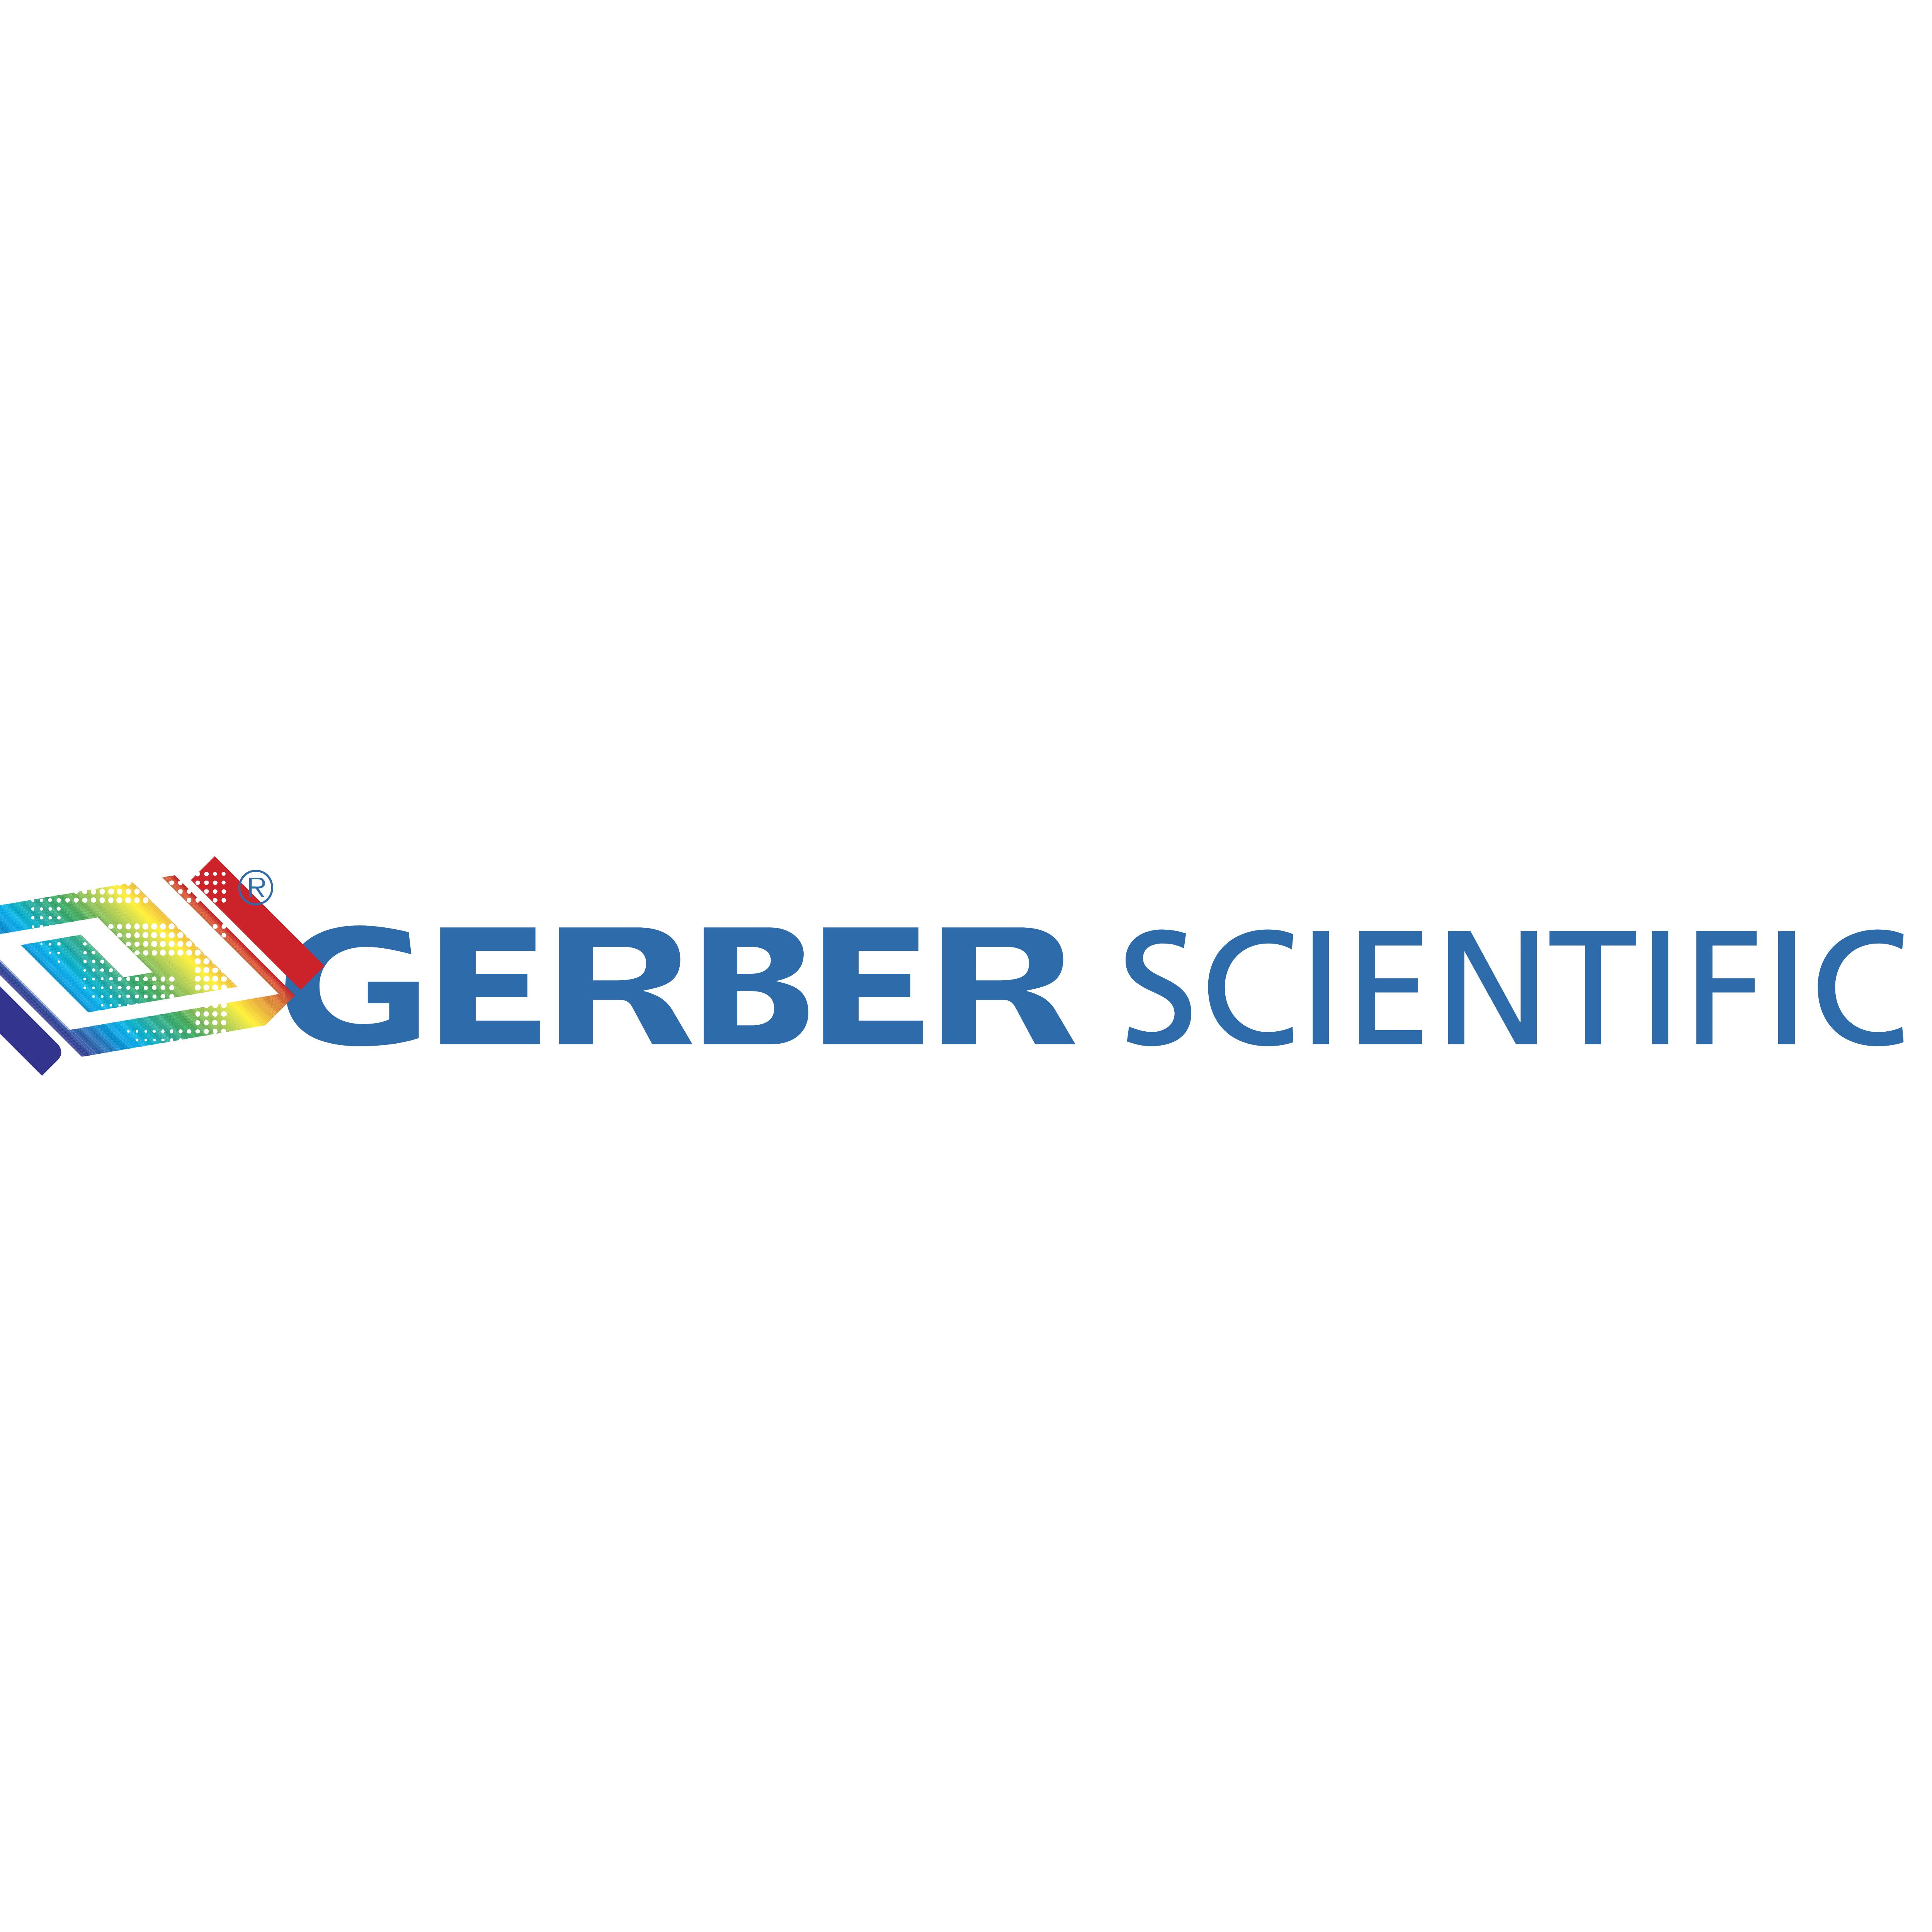 Gerber Scientific Inc. logo